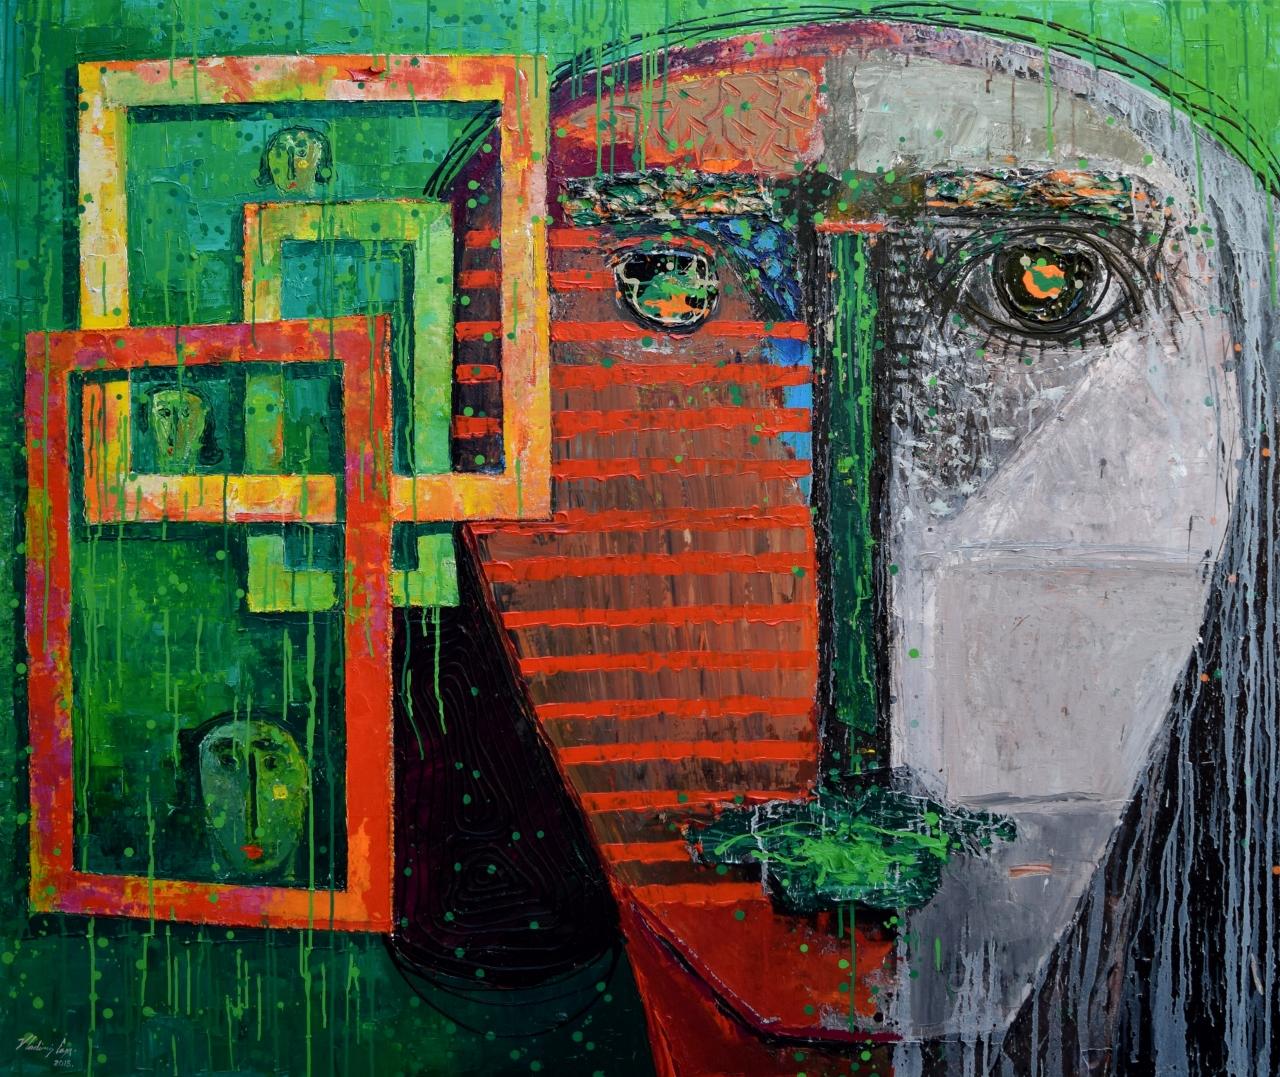 LAS VENTANAS by Mr. VLADIMIR CORA - Masterpiece Online